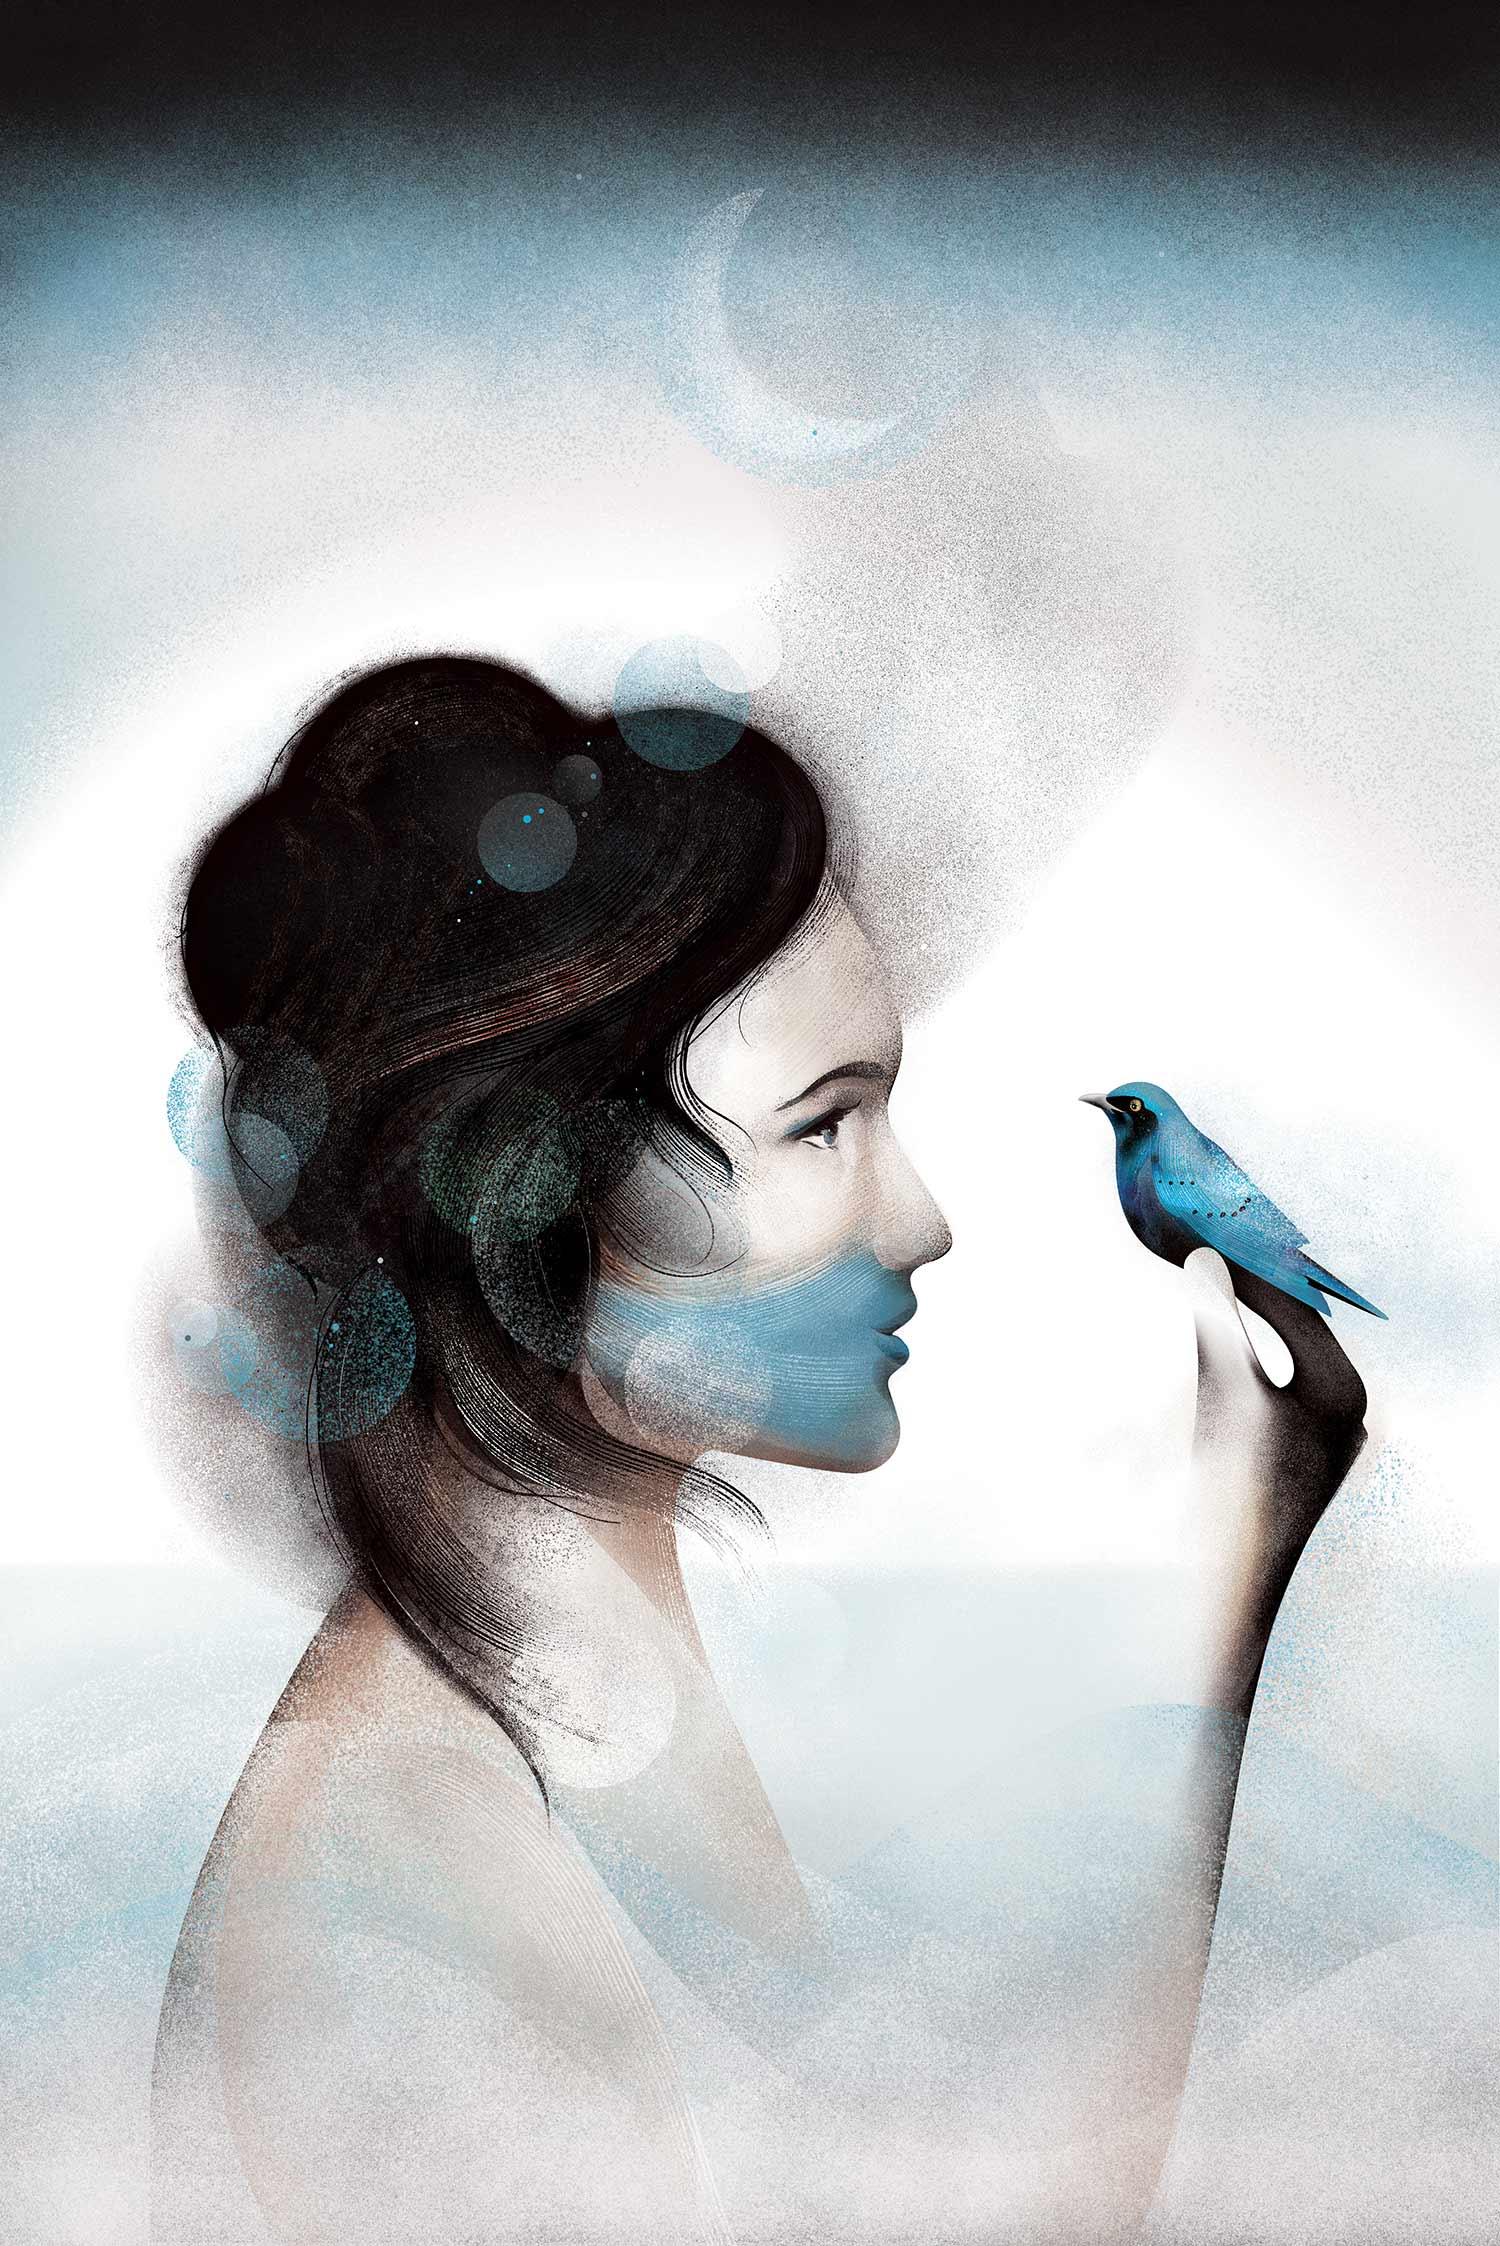 woman_and_nature_karla_sanders_illustration.jpg